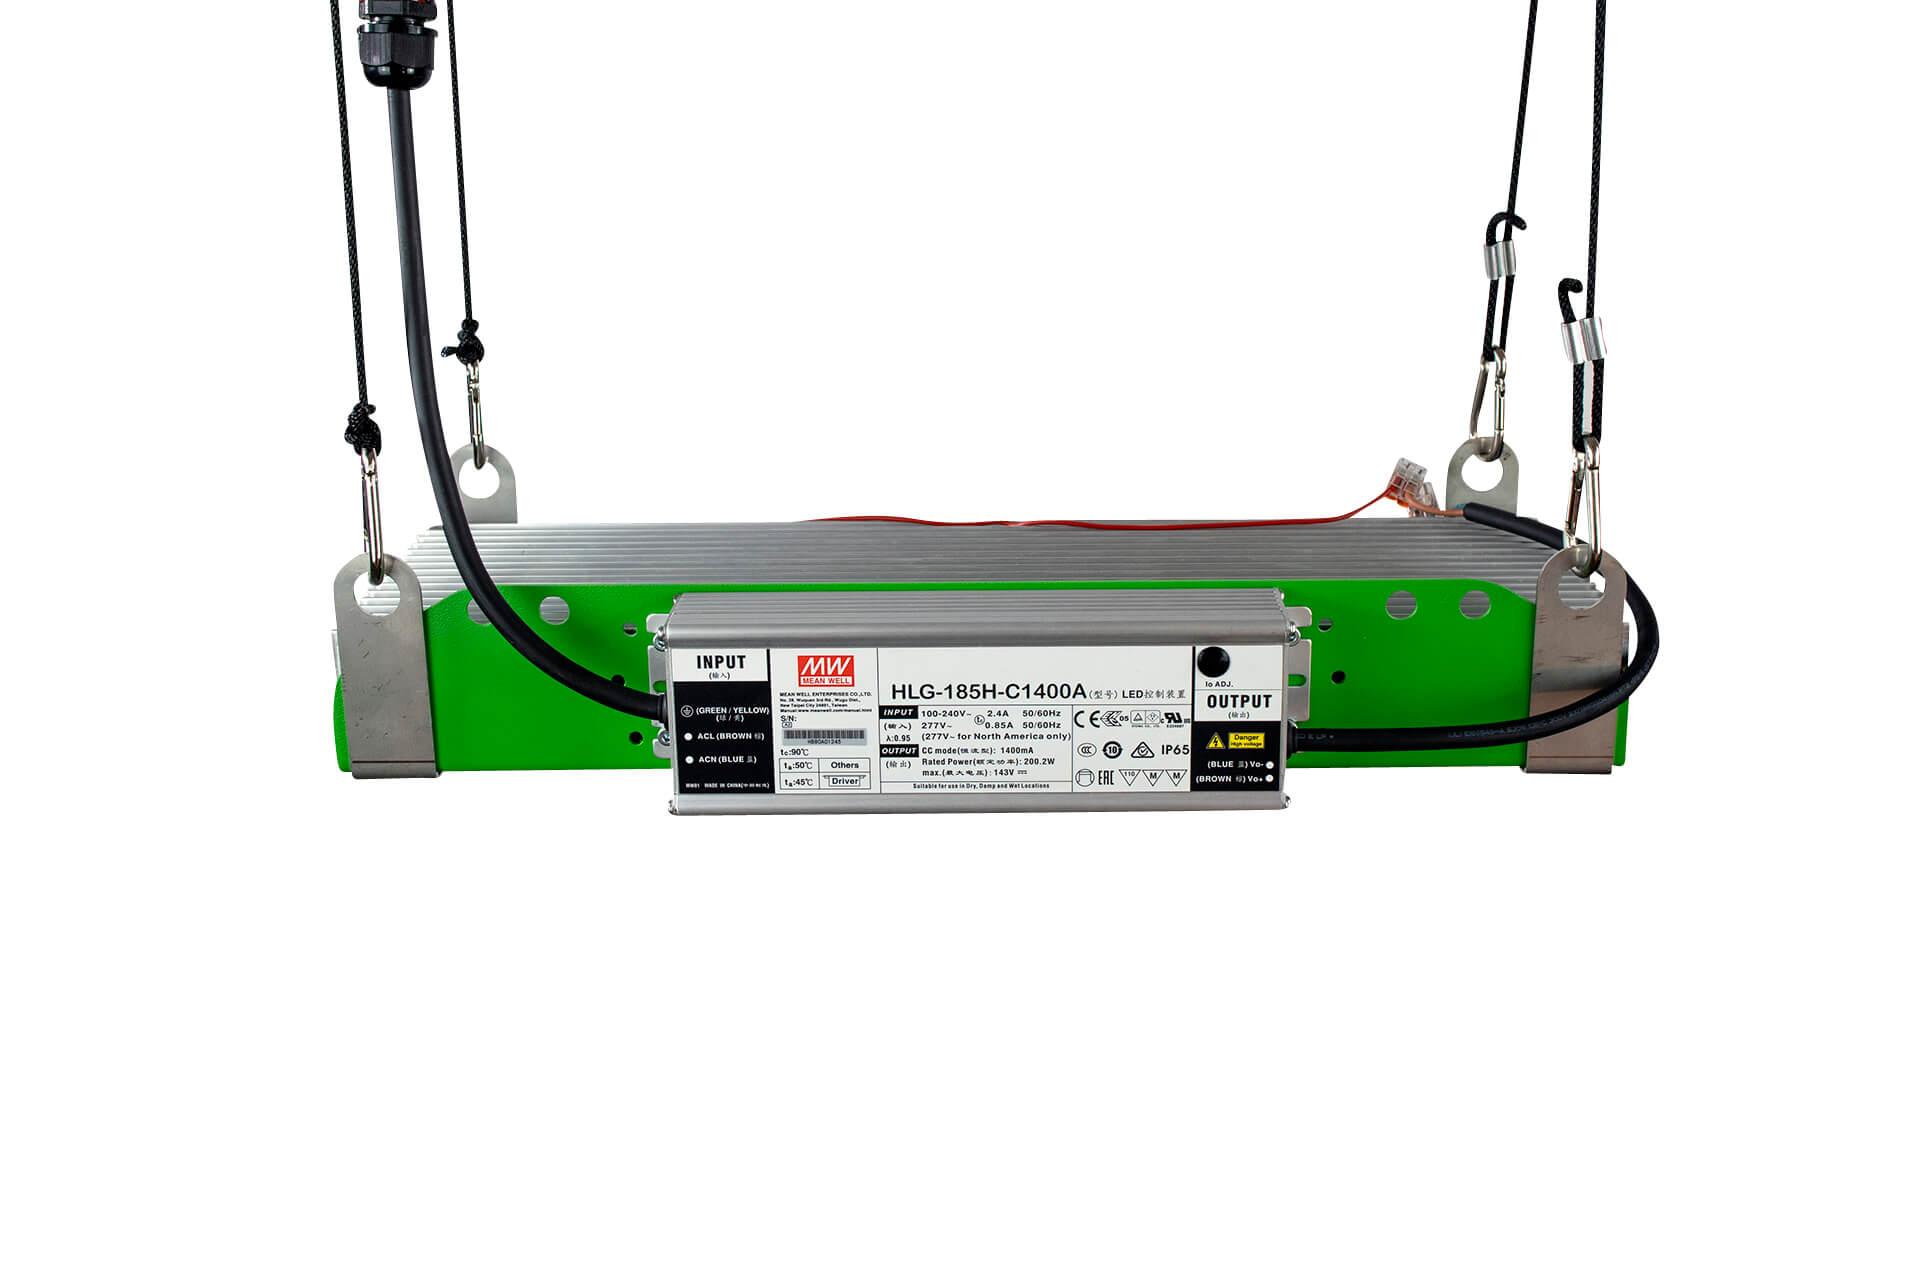 DIY-M-KIT-SMD-100w-top-down-view-samsung-osram-led-pro-emit